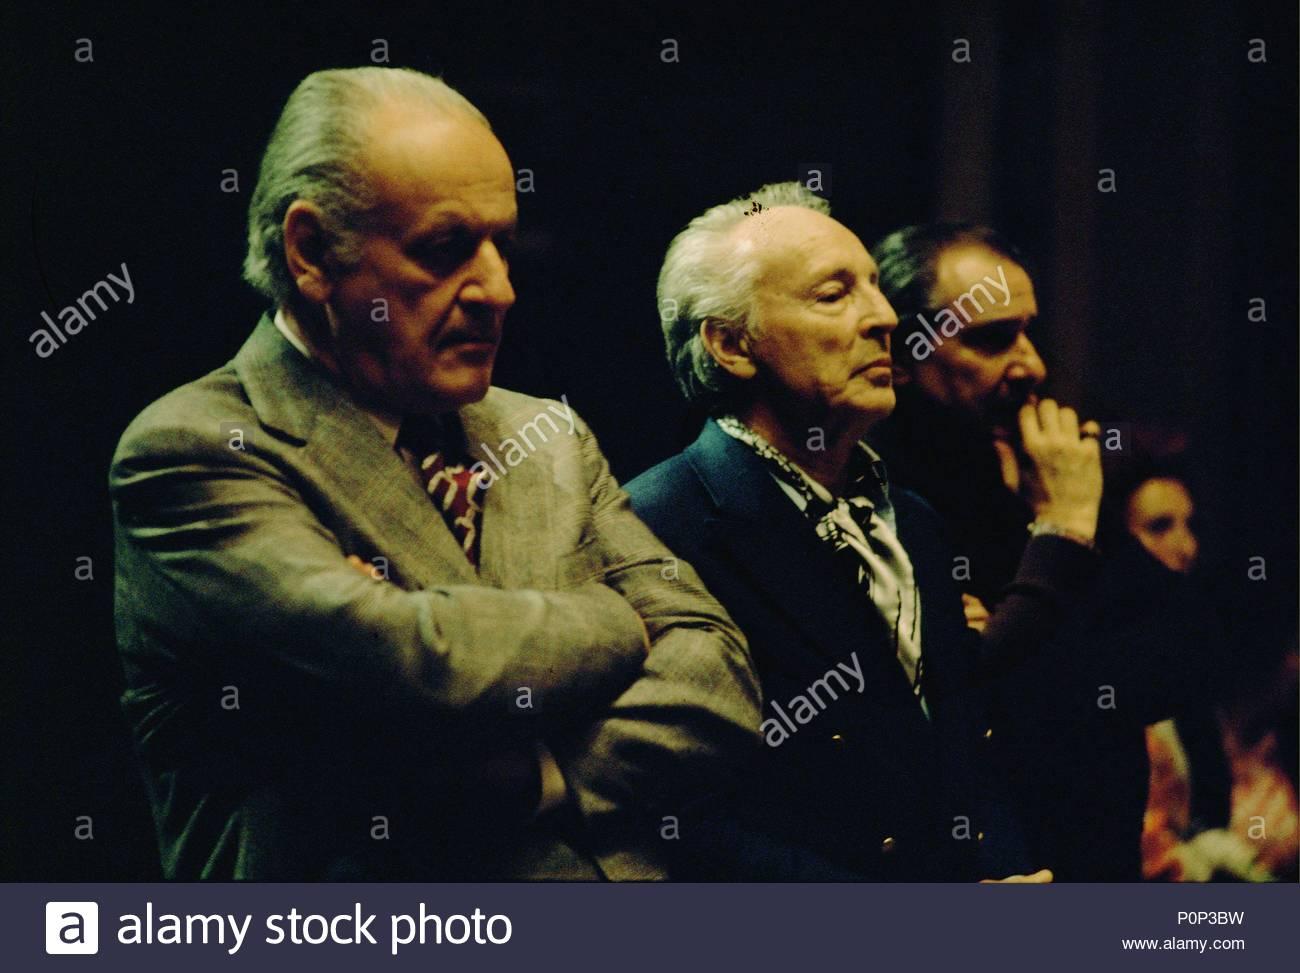 Watching a researsal at the Palais Garnier are director Rolf Liebermann (left) and choreographer Georges Balanchine, Paris,1973. Location: Operahouse Palais Garnier, Paris, France. - Stock Image